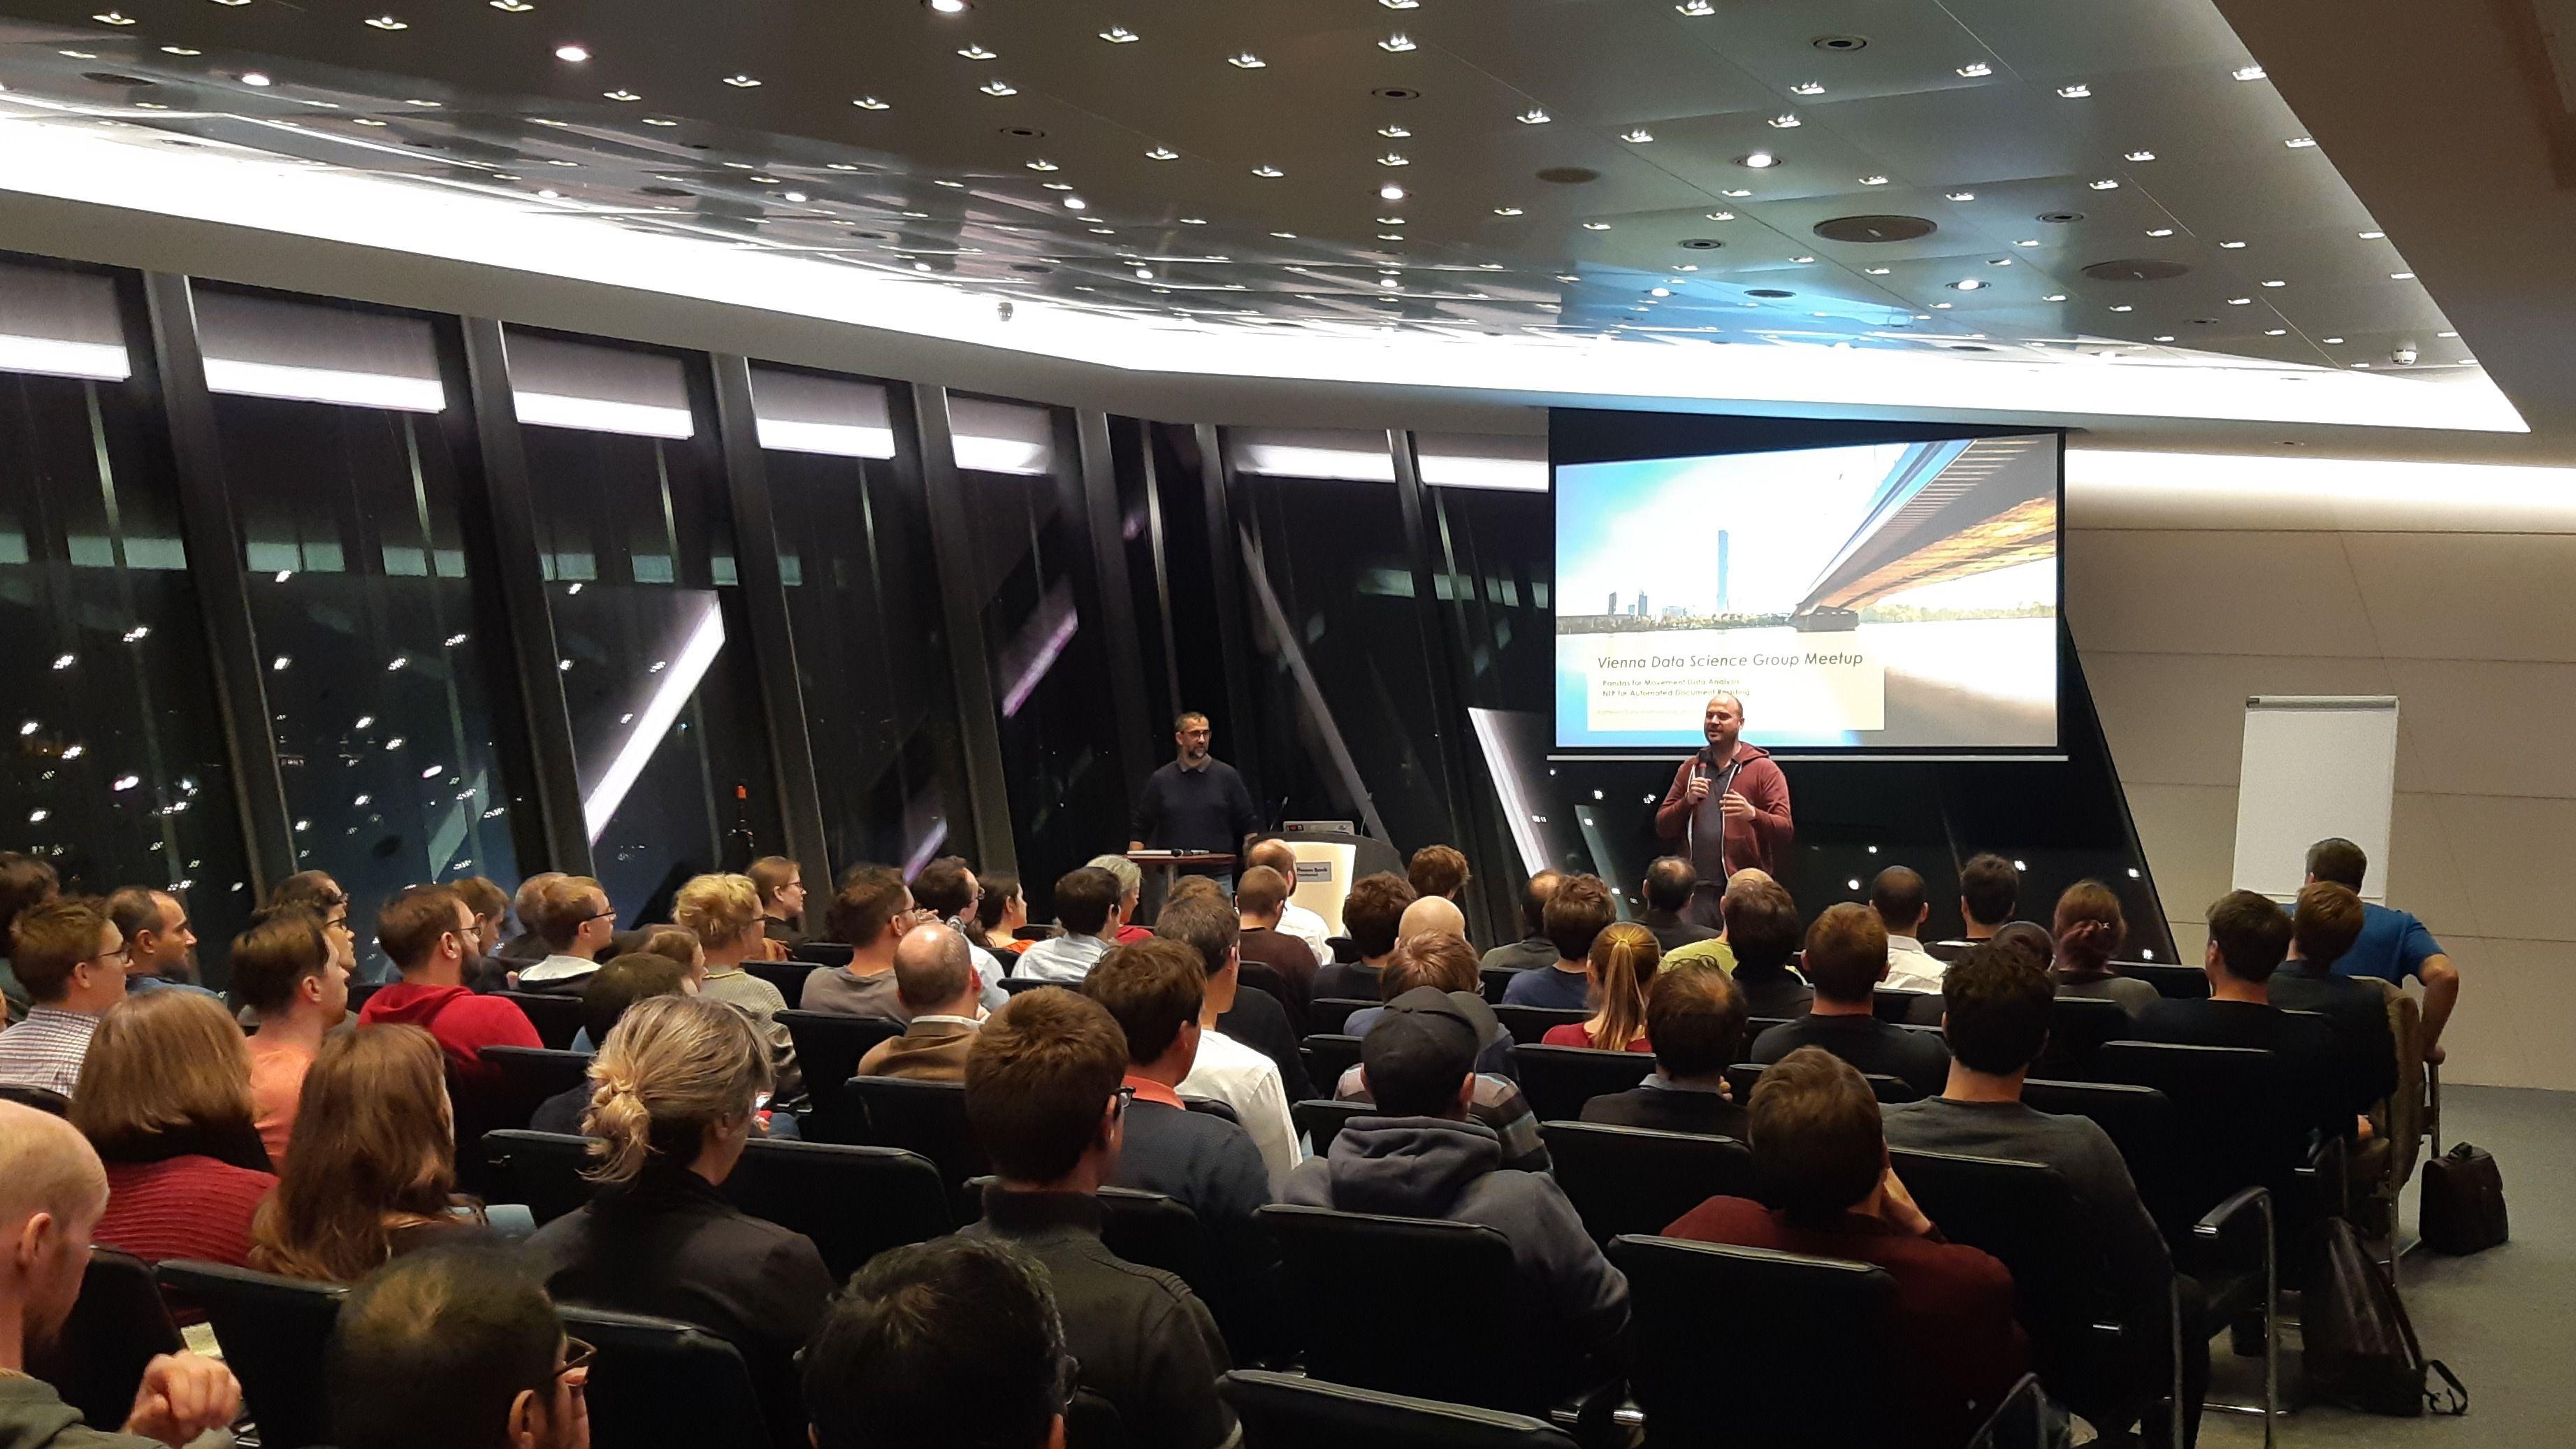 Vienna Data Science Group Meetup